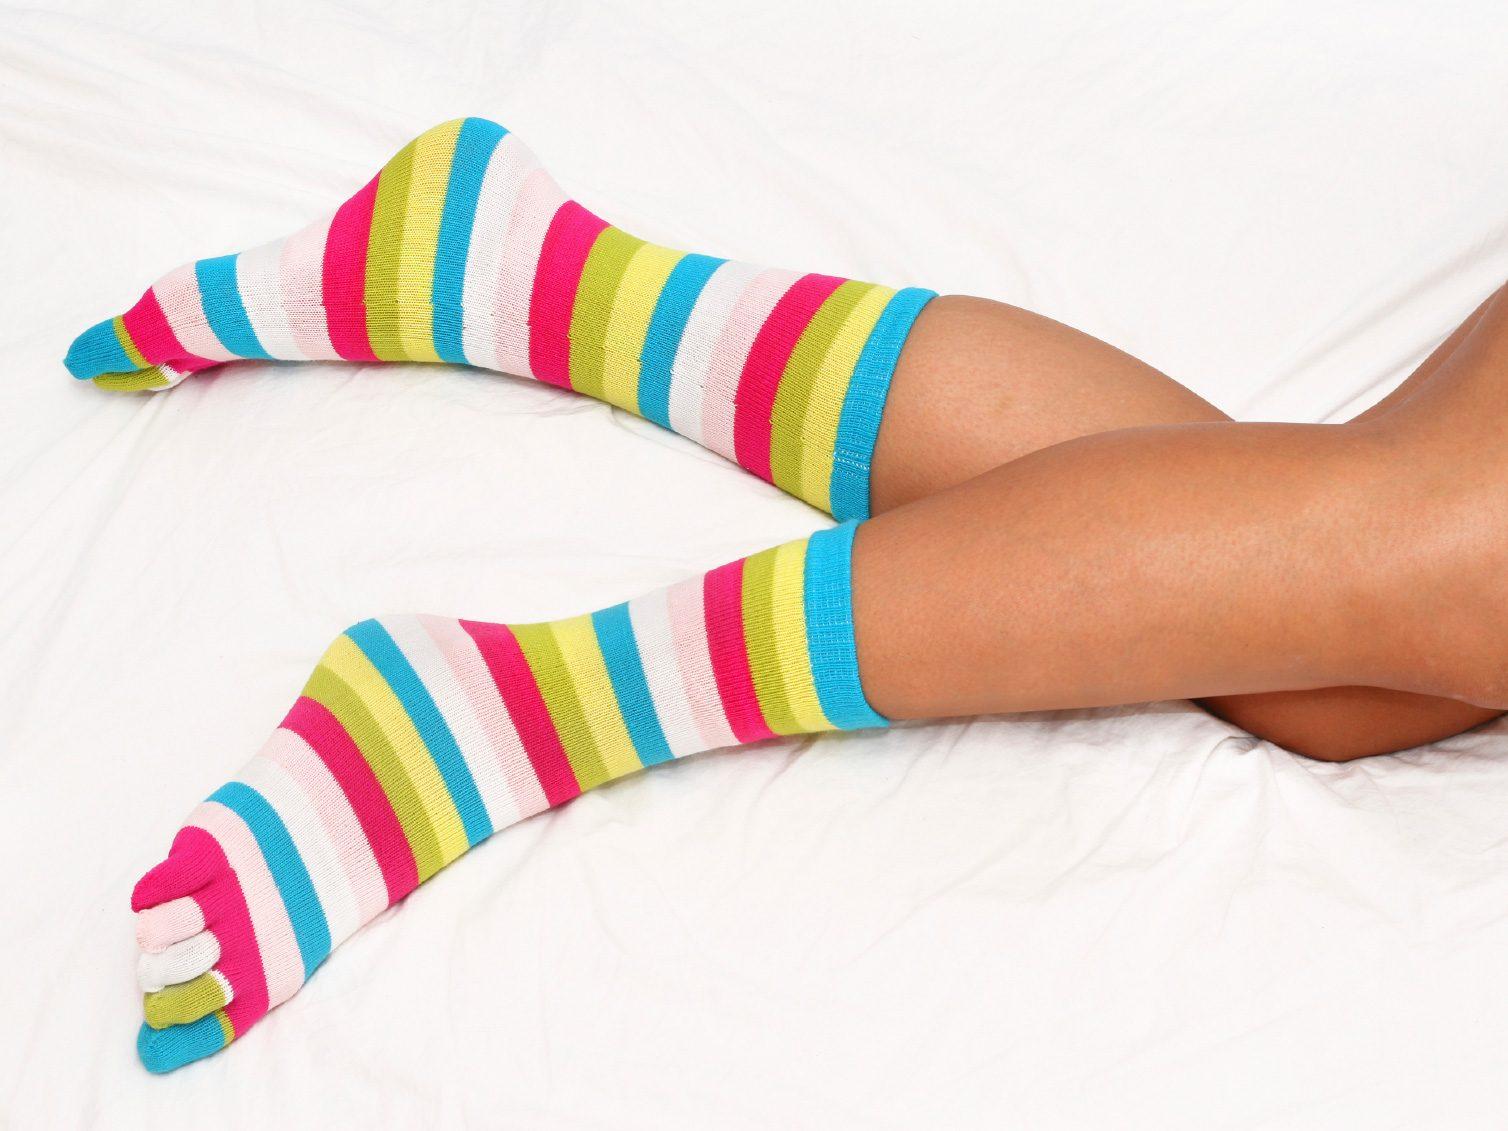 Socks are Conducive to a Sound Slumber